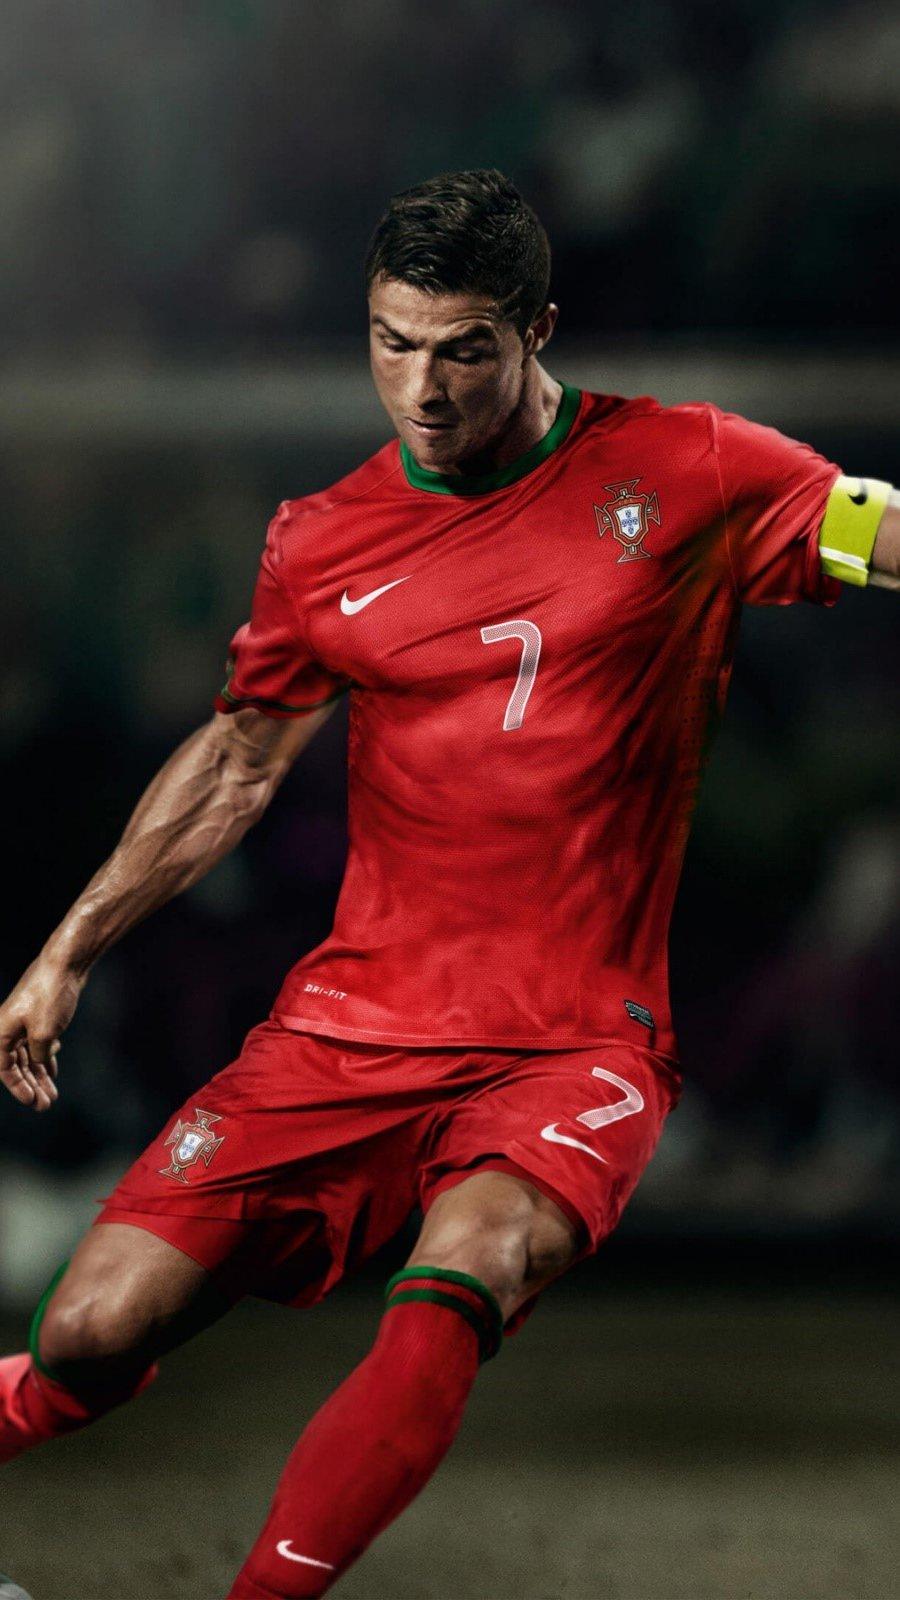 Wallpaper Soccer player Cristiano Ronaldo Vertical